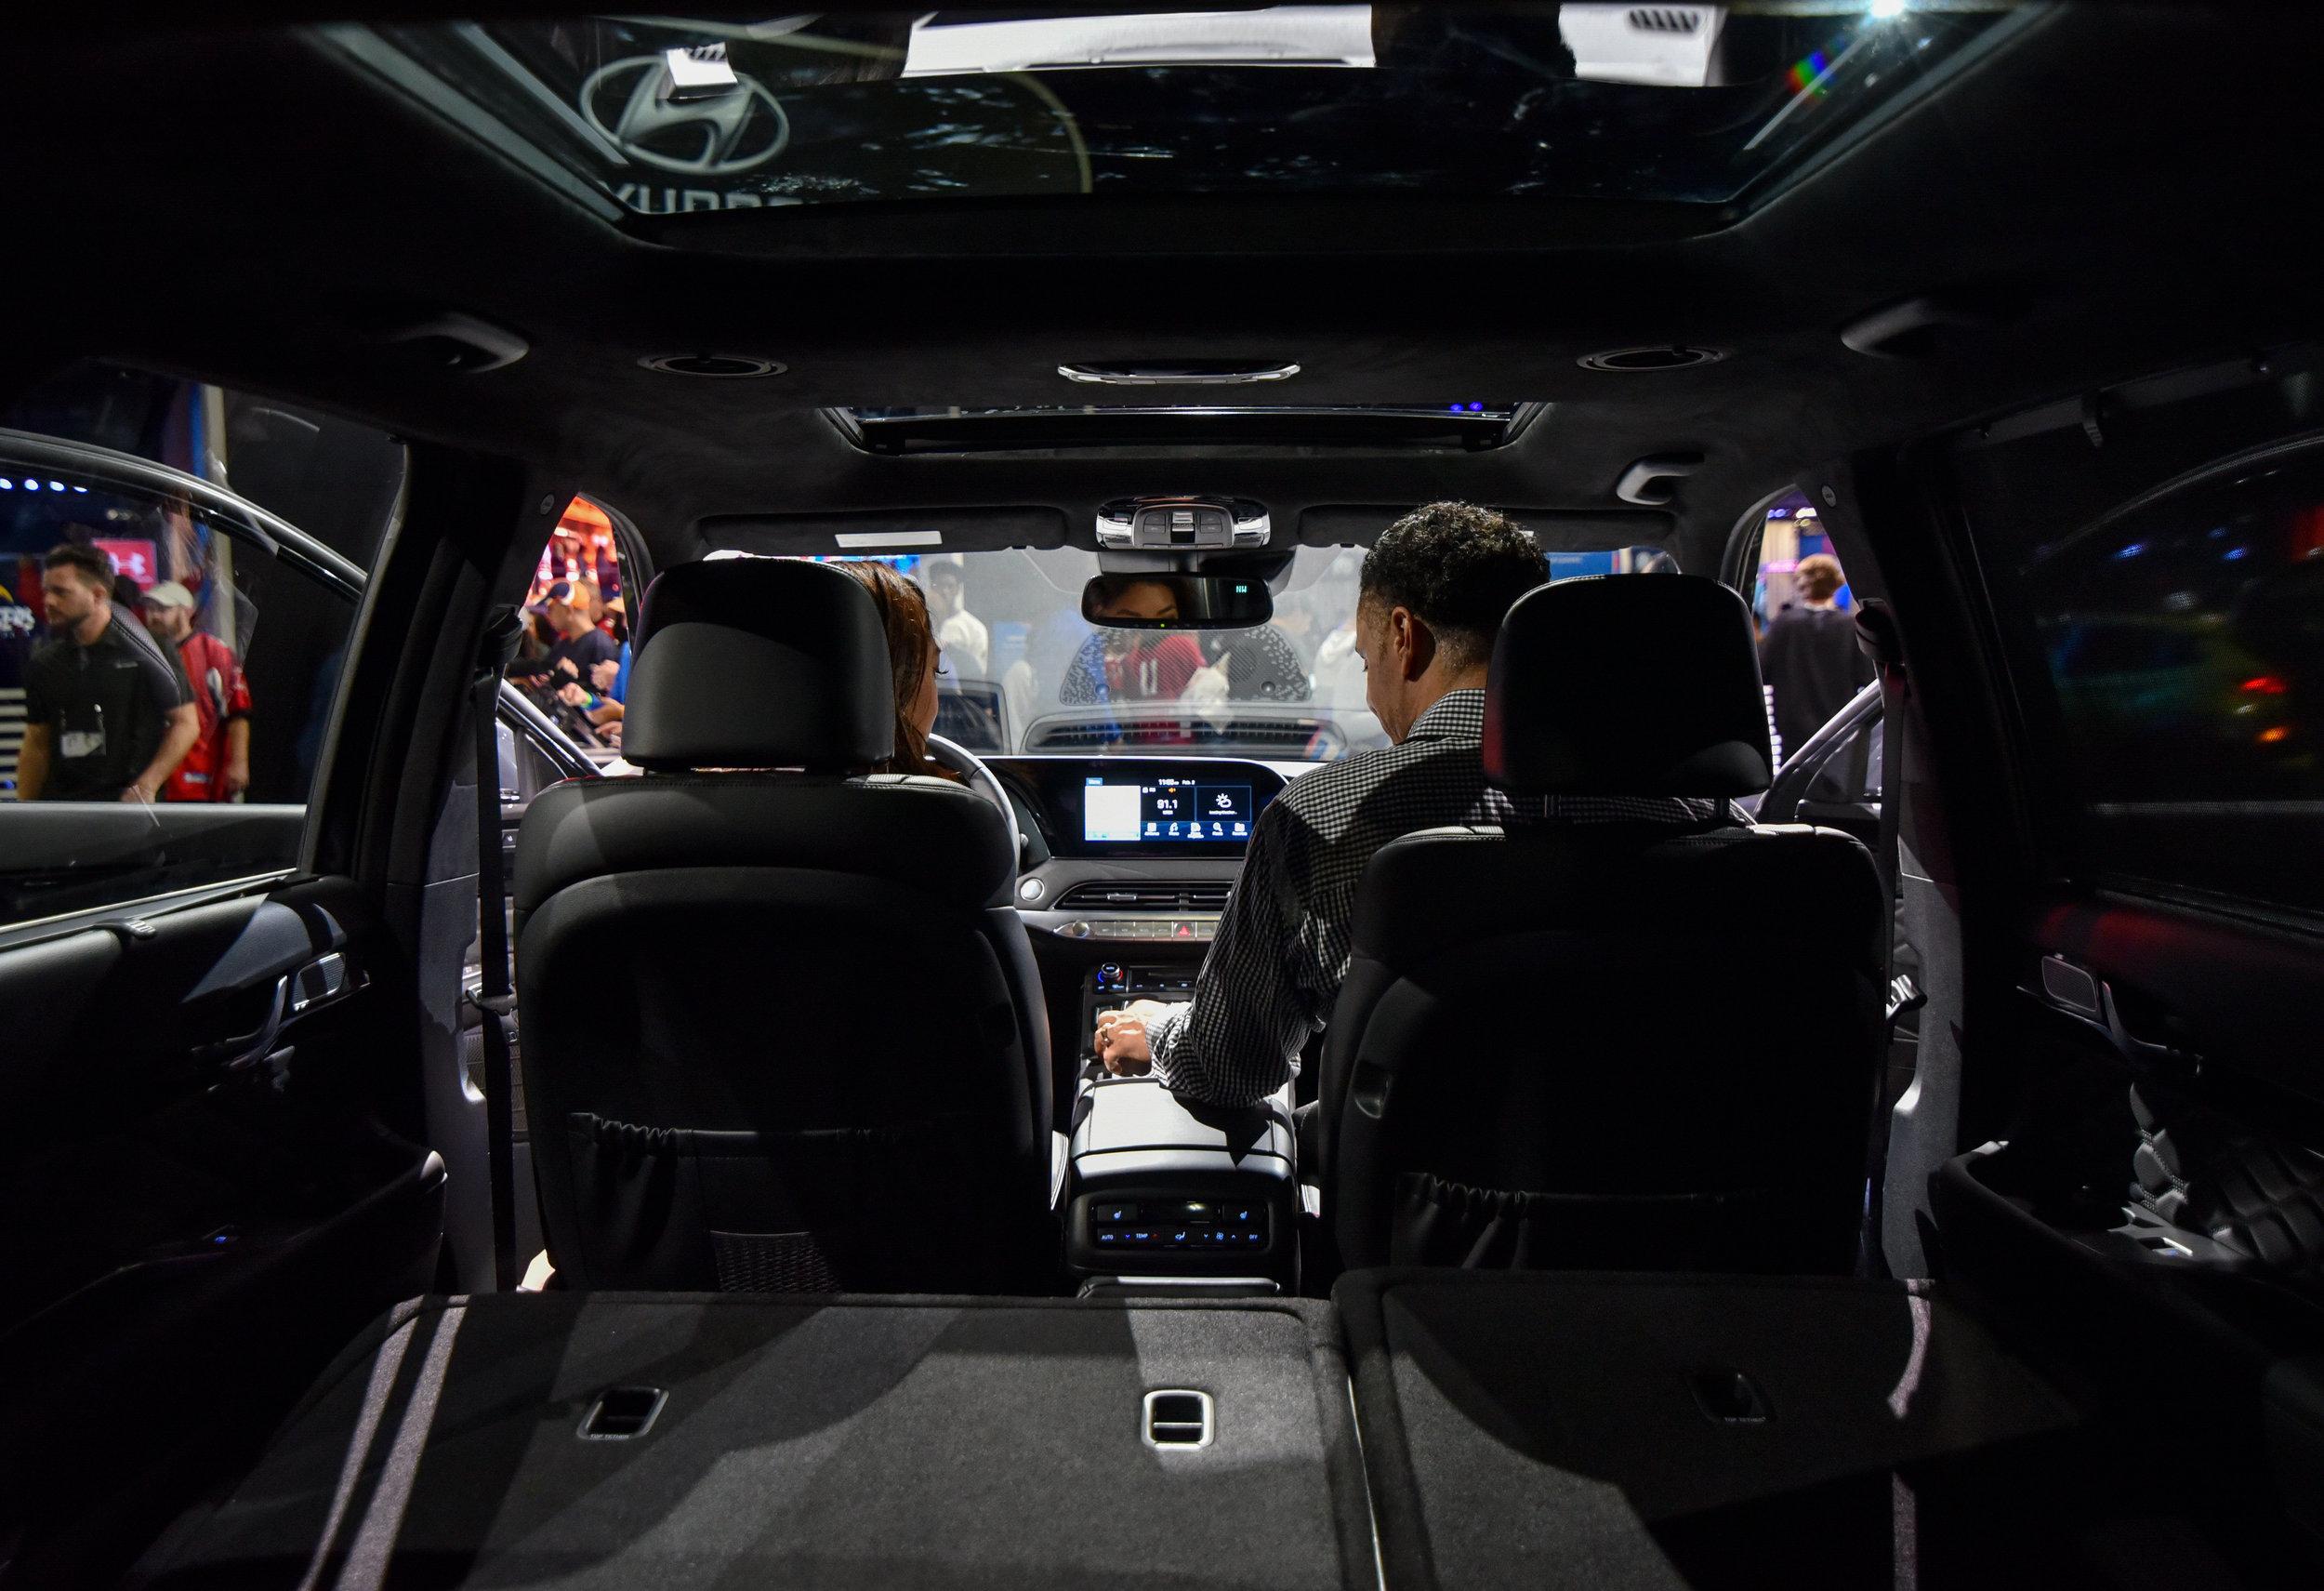 OHM-AdvantageInternational-Hyundai@SBExperience-TopSelects-2-11.jpg